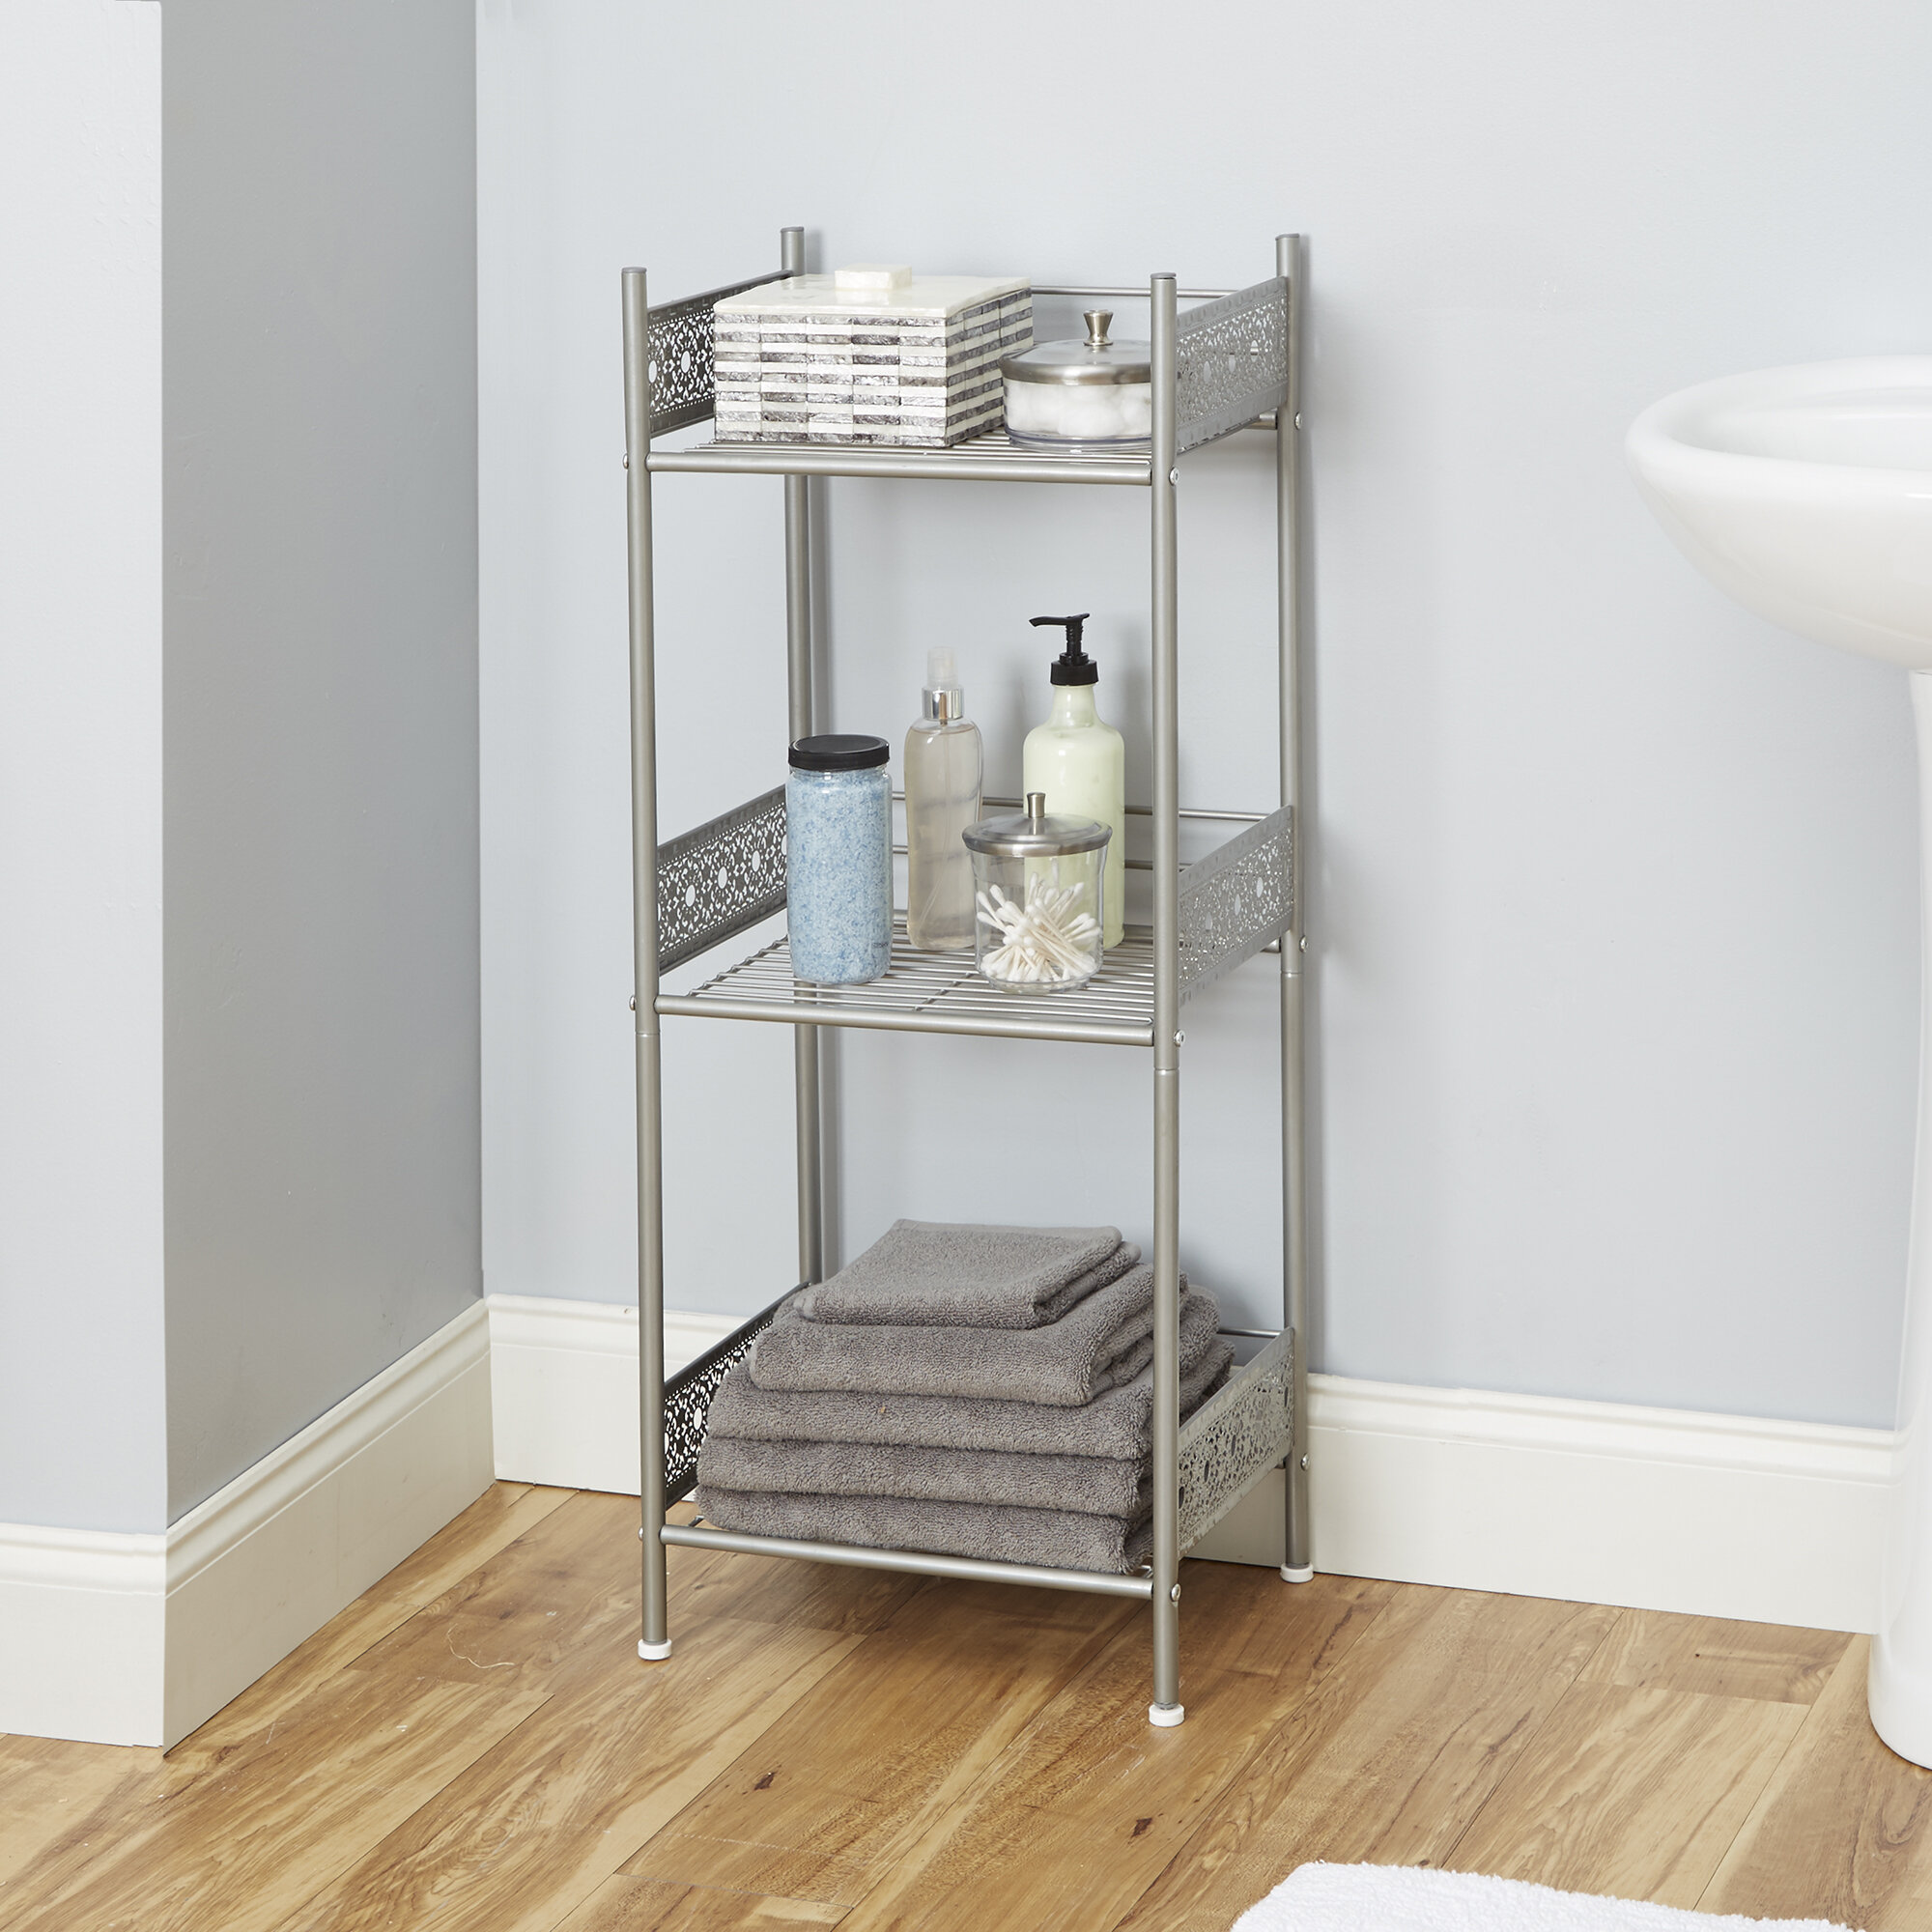 full size shelving designs furniture shelf decorations in ideas bathroom